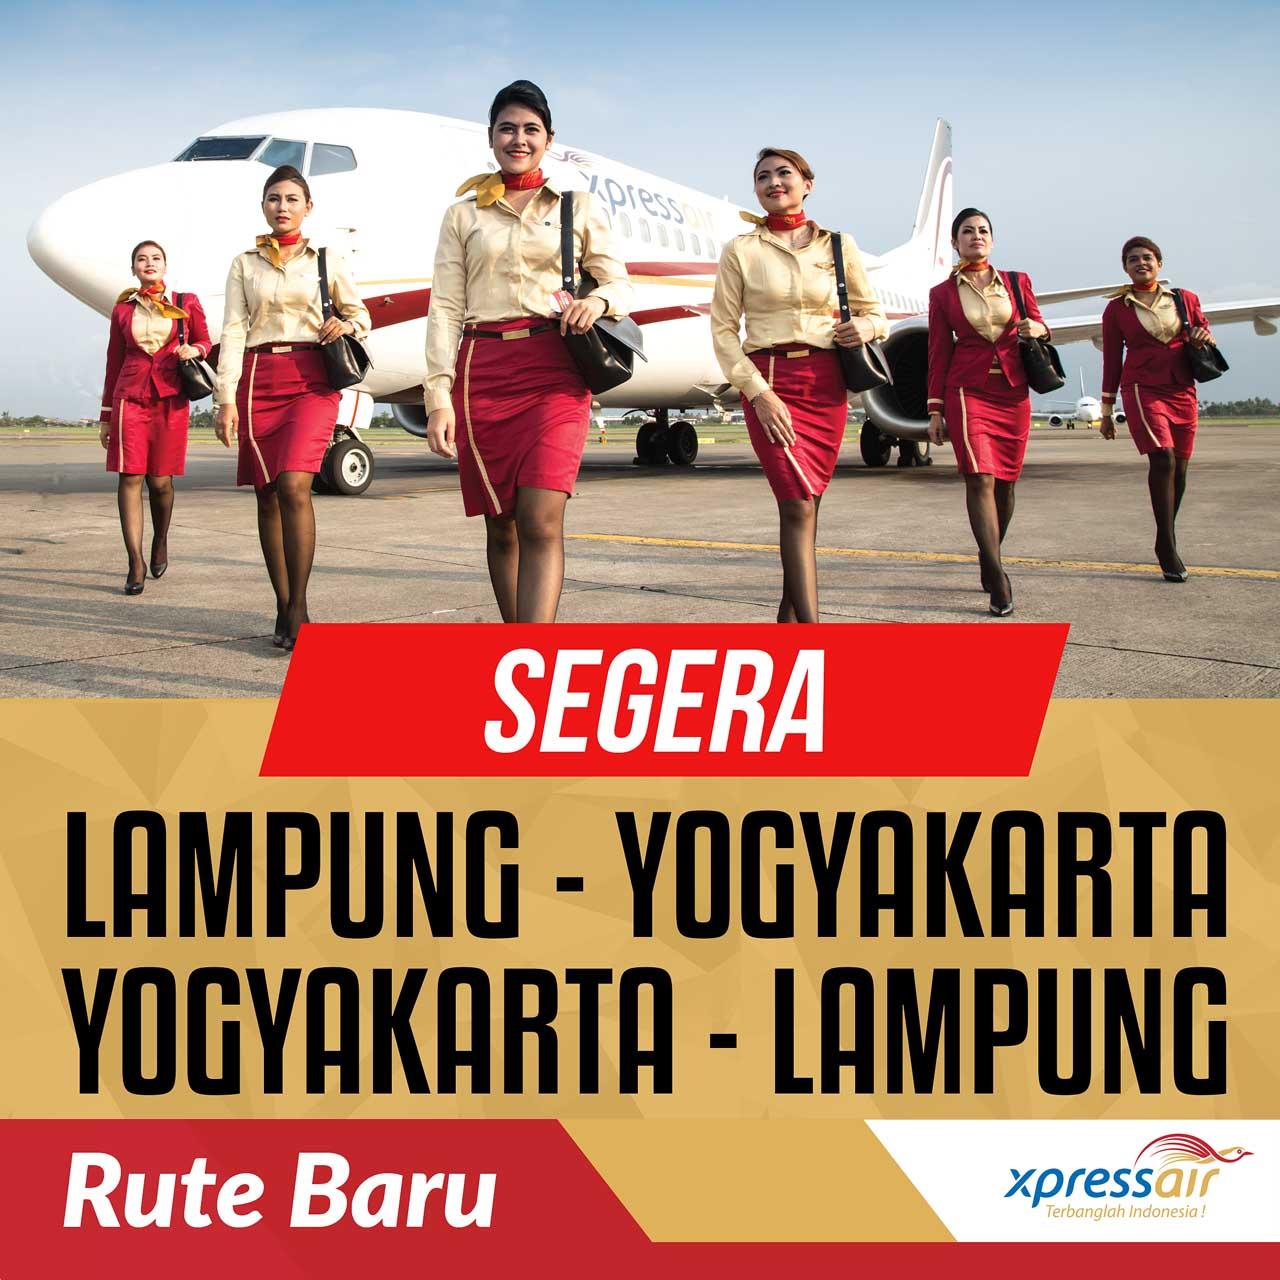 Tiket Pesawat Murah Lampung Yogyakarta Jogja Dan Yogyakarta Jogja Lampung Dengan Pesawat Xpress Air Tanpa Transit Menulis Indonesia